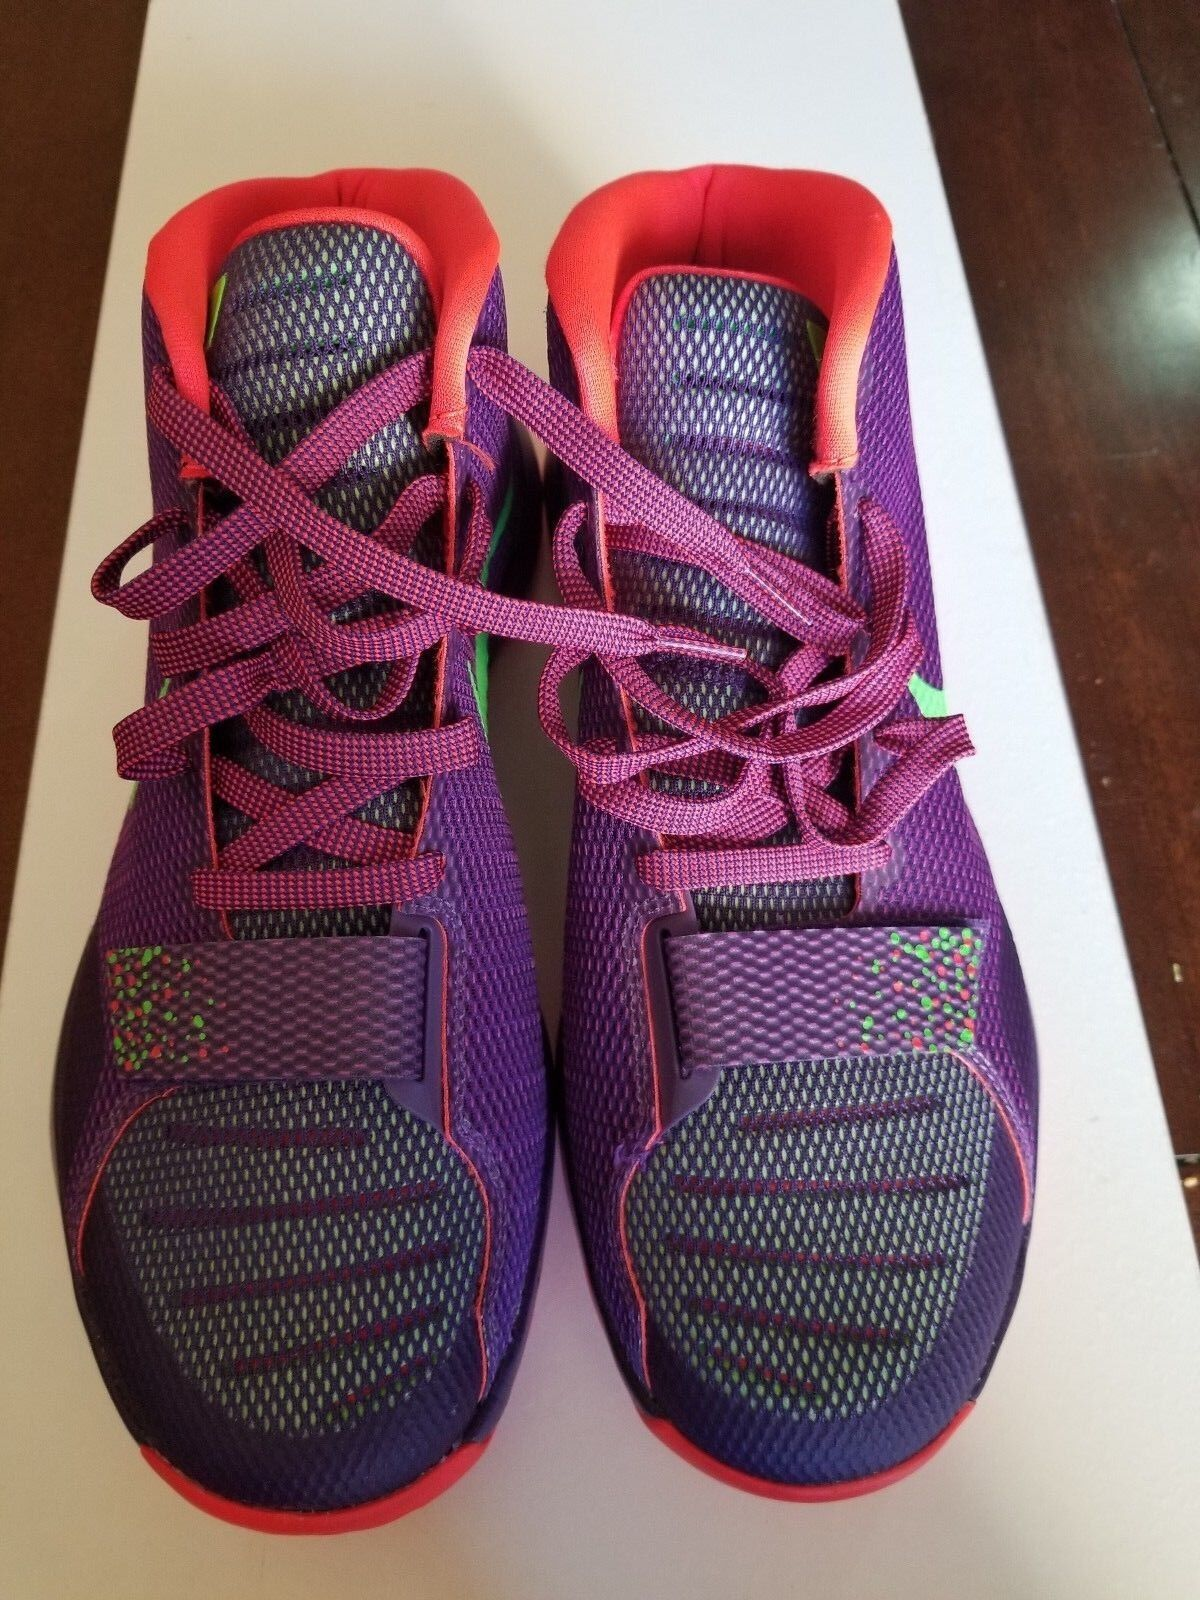 Nike KD Trey 5 III Mens Basketball Shoes 749377-536 Court Purple Green Size 11